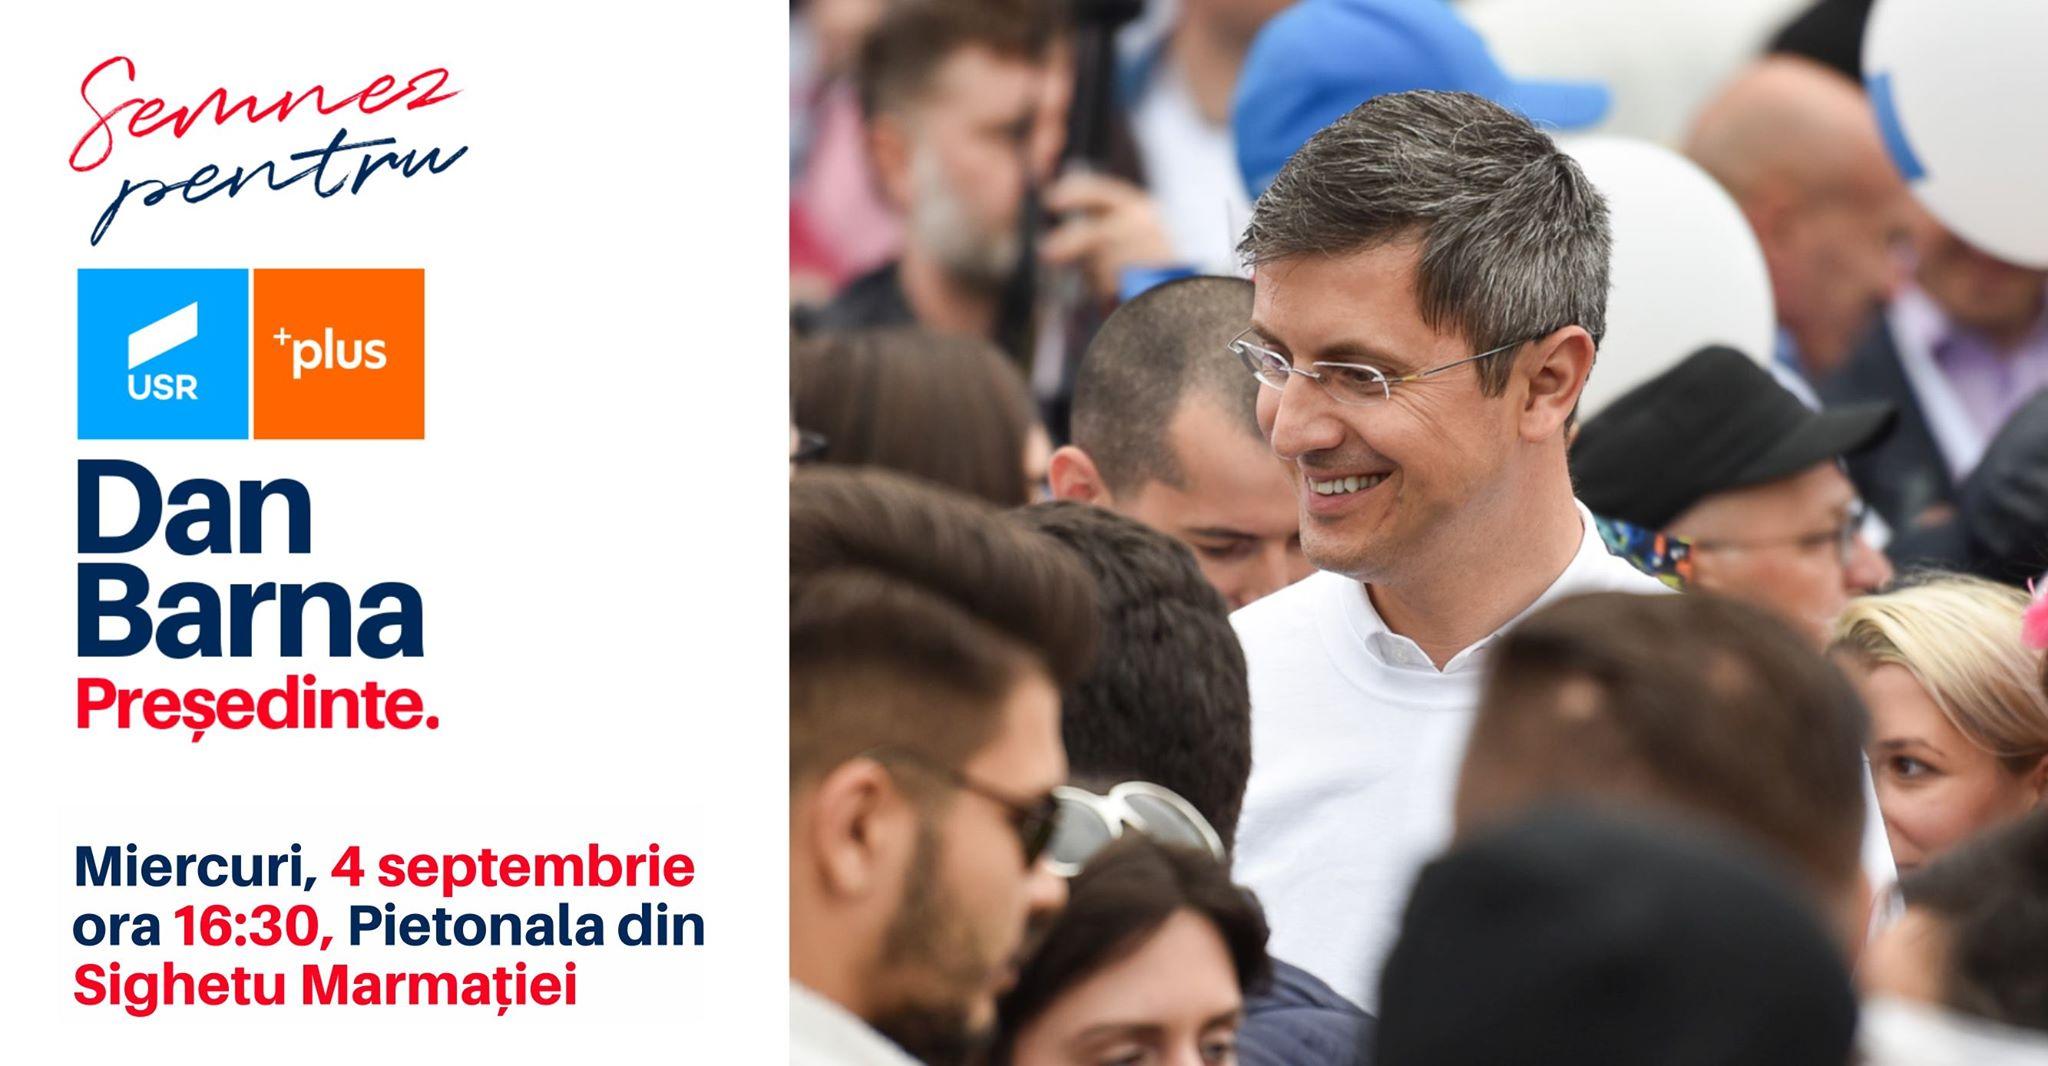 Dan Barna, candidatul Aliantei USR Plus la presedintie, in Sighetu Marmatiei si in Baia Mare